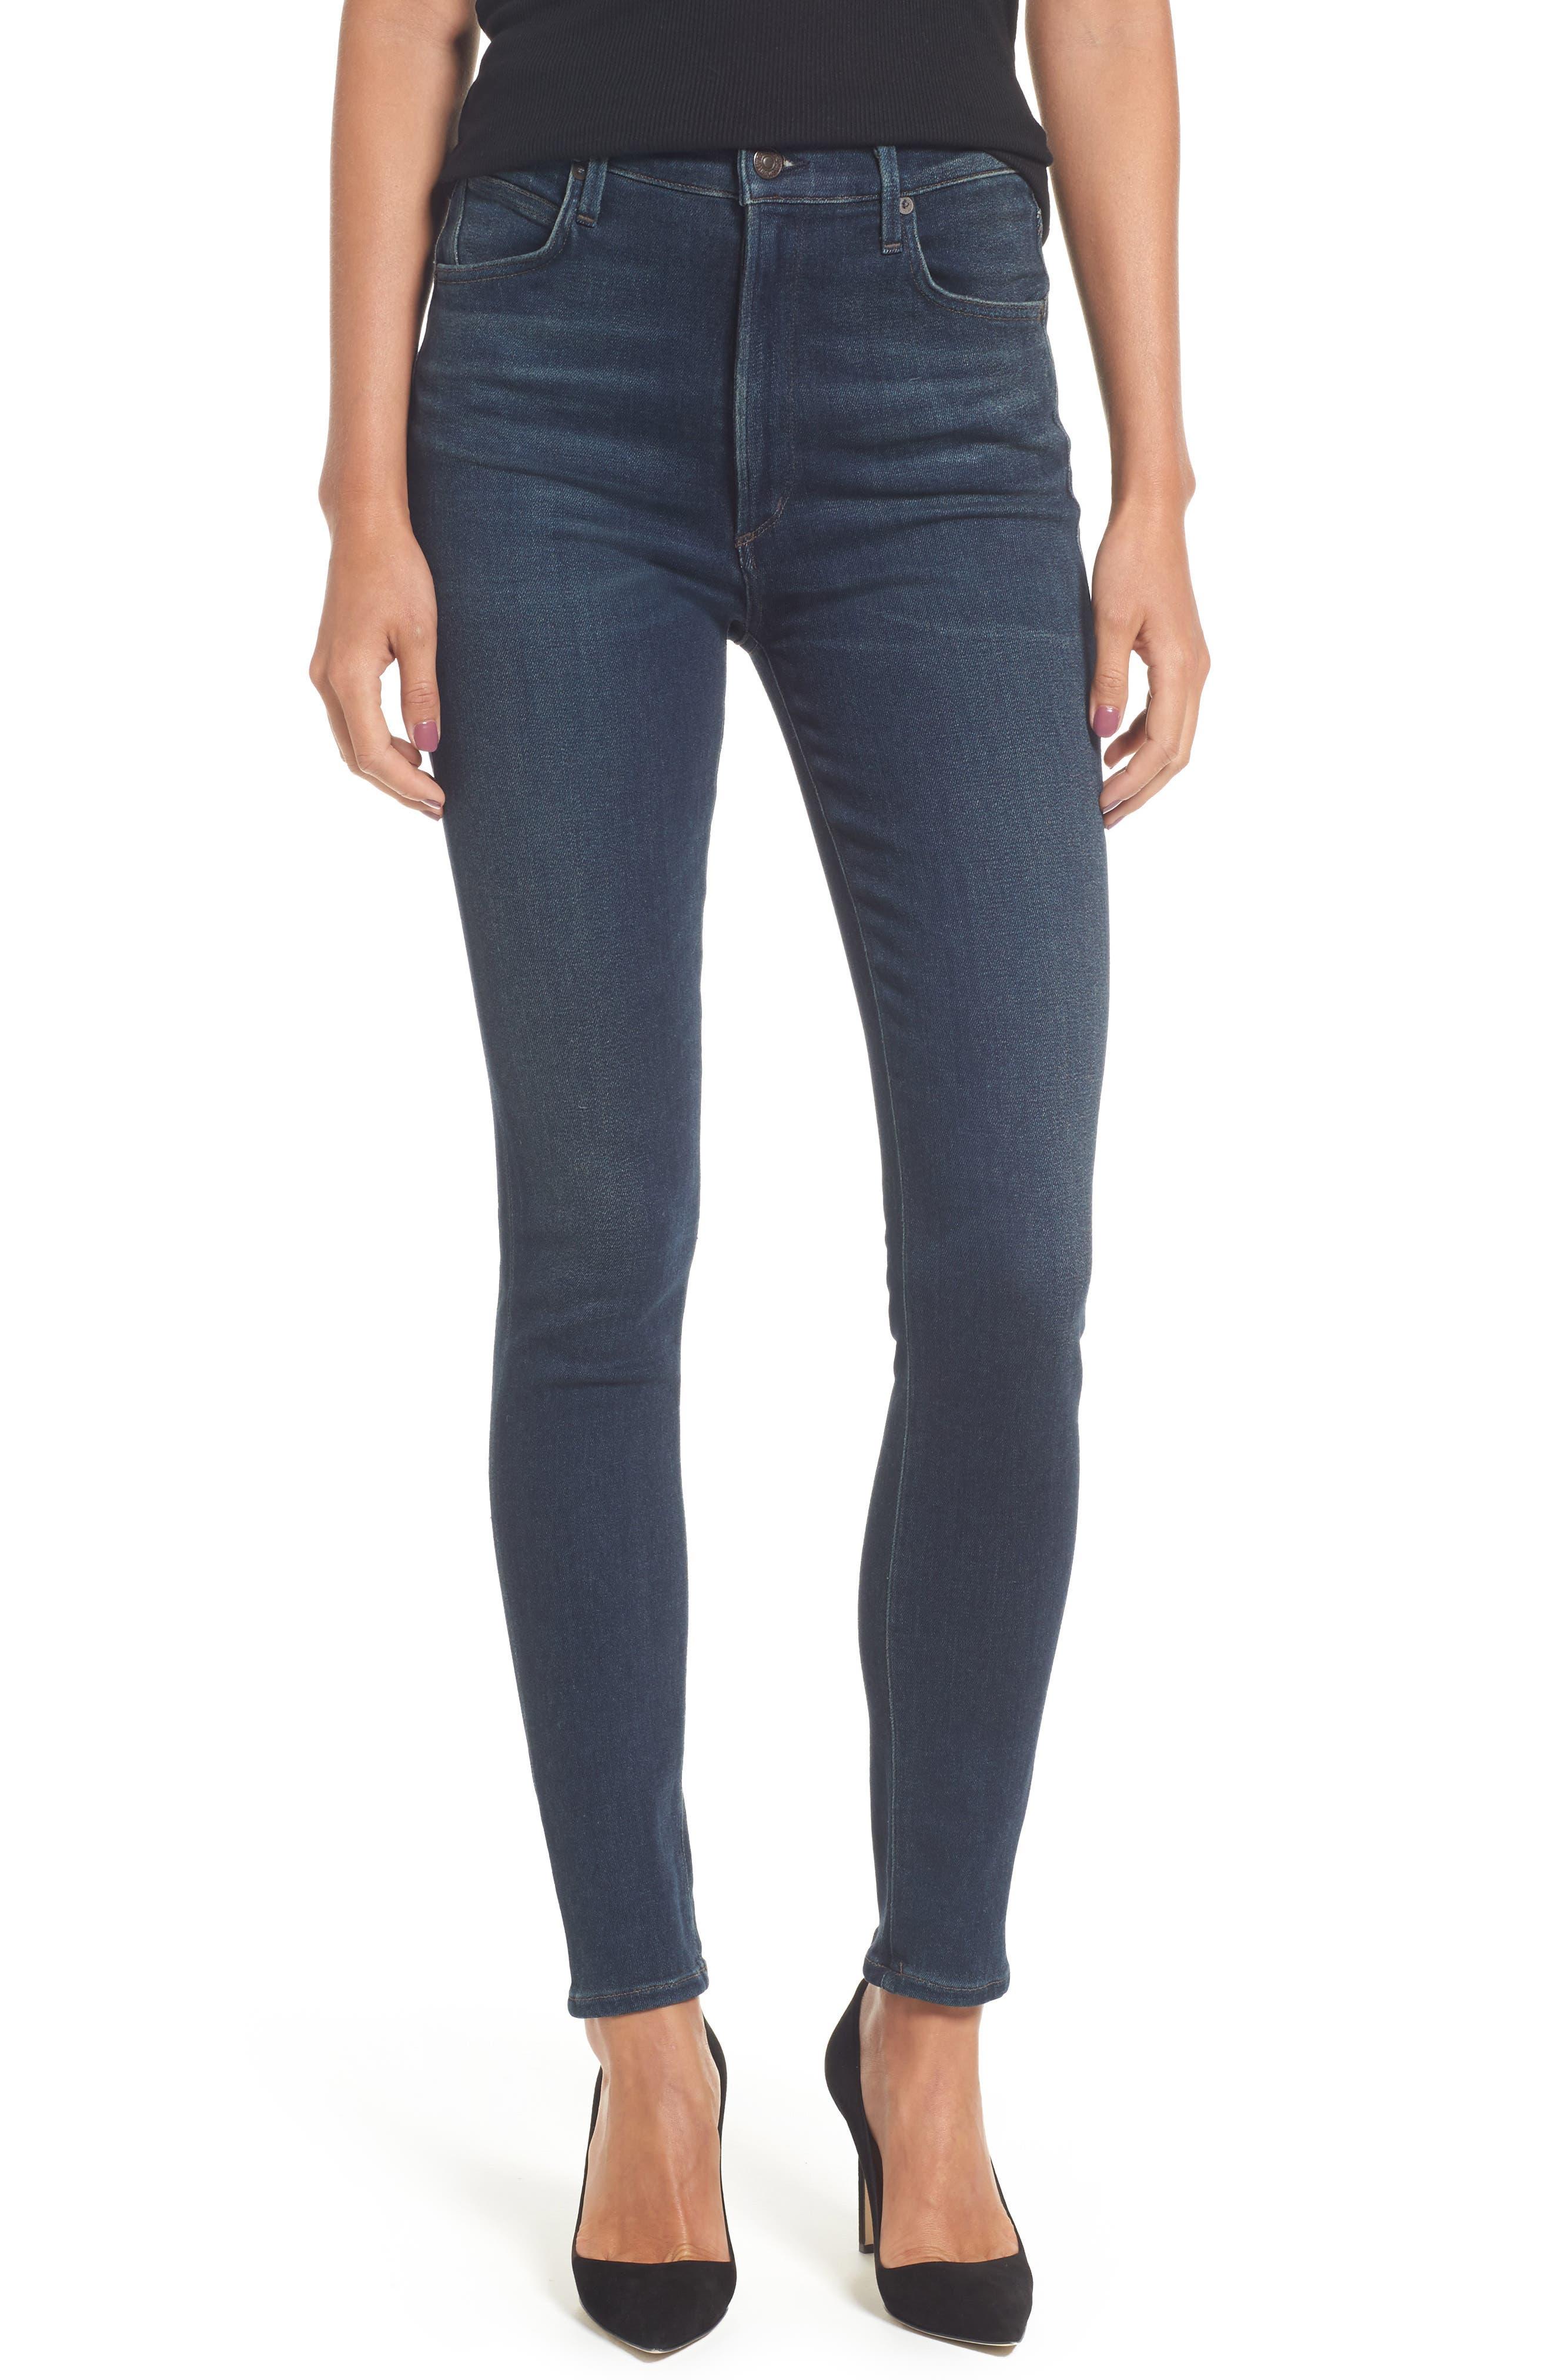 Chrissy High Waist Skinny Jeans,                         Main,                         color, Haze